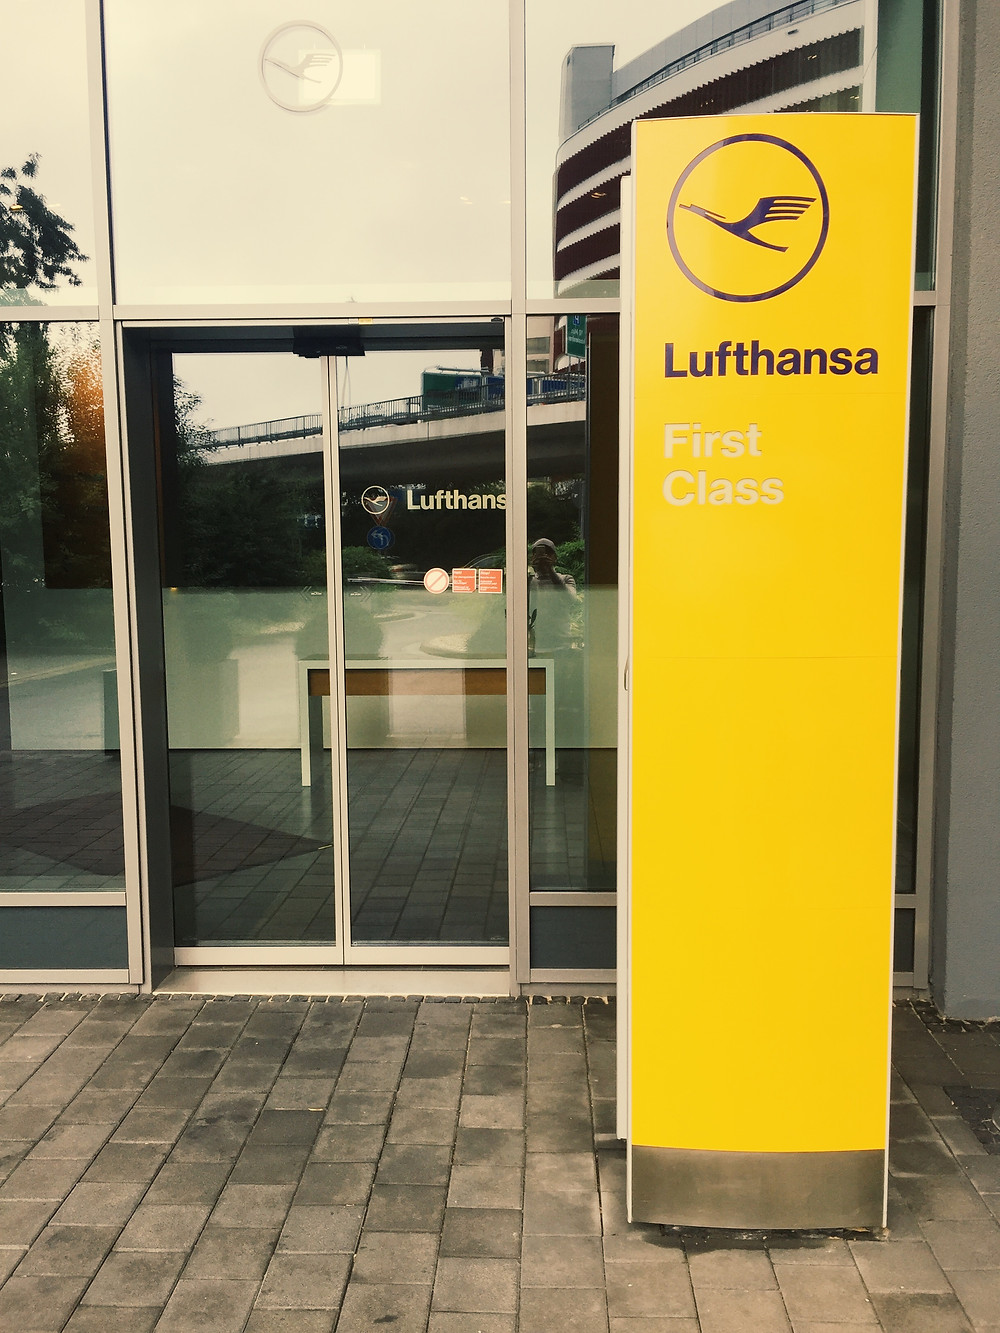 Lufthansa First Class Terminal, Ground Floor Entrance